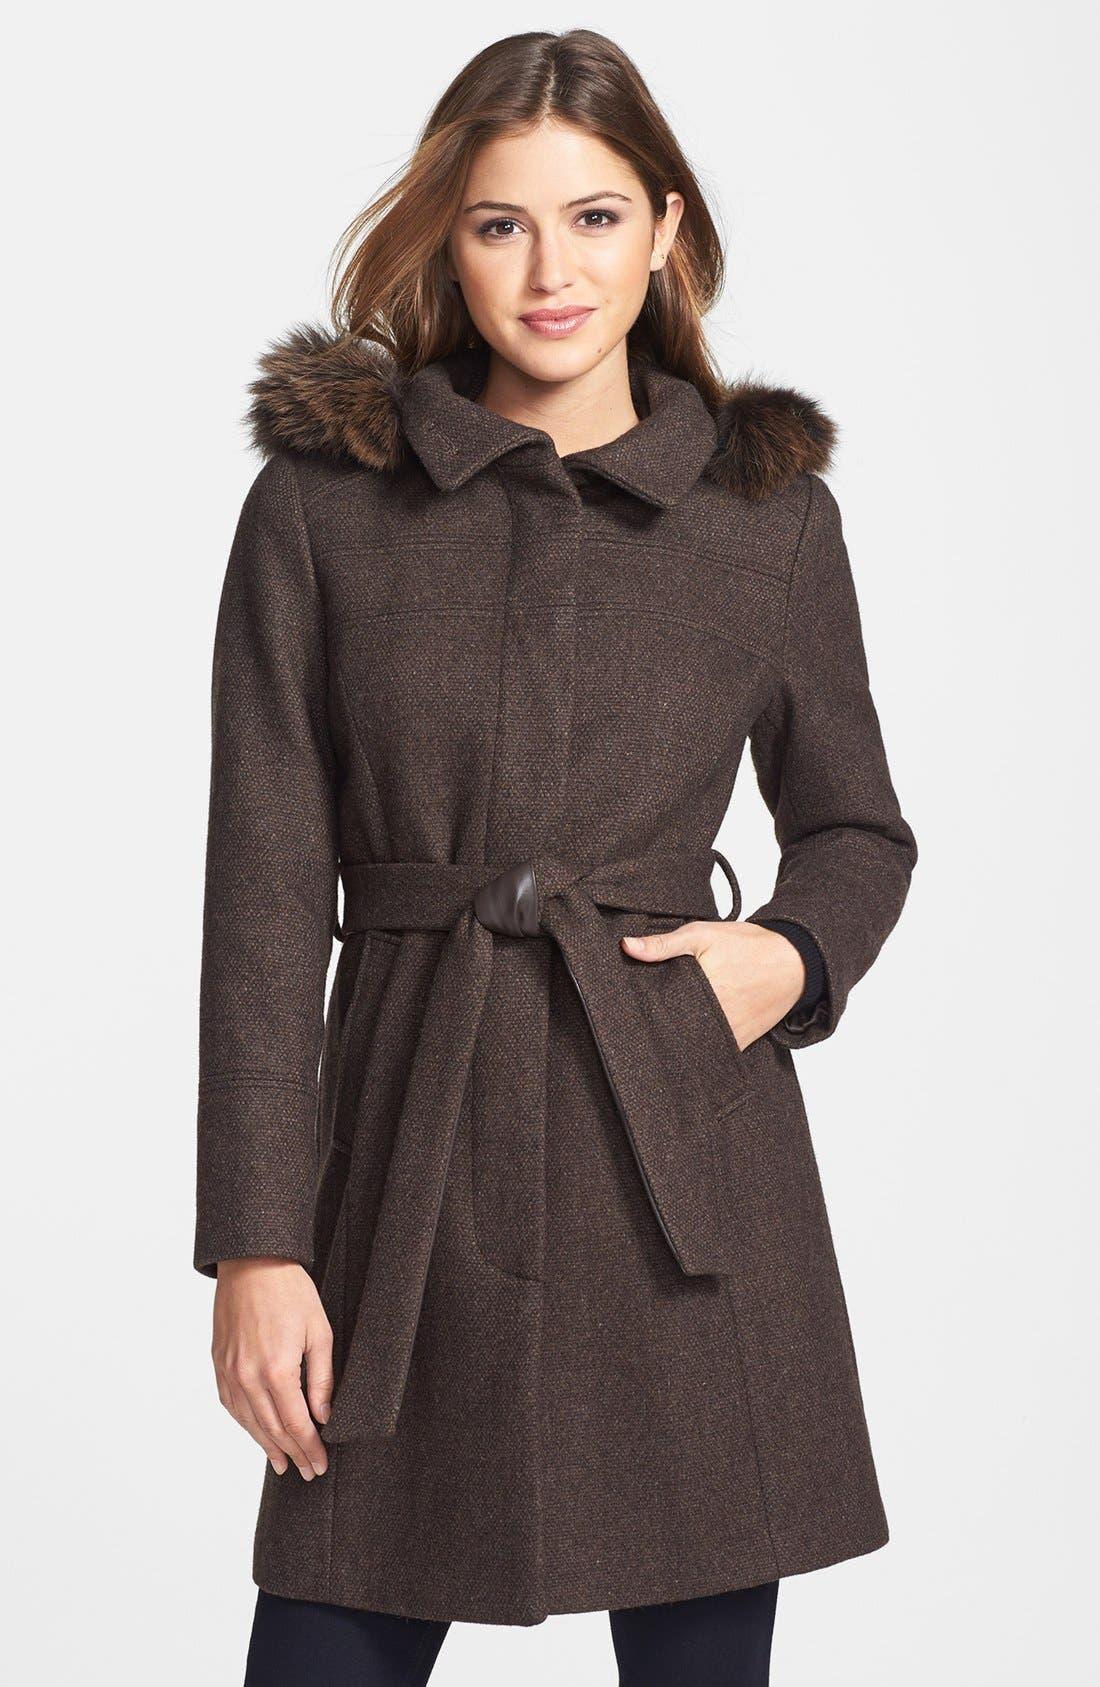 Alternate Image 1 Selected - Ellen Tracy Genuine Coyote Fur Trim Hooded Coat (Online Only)